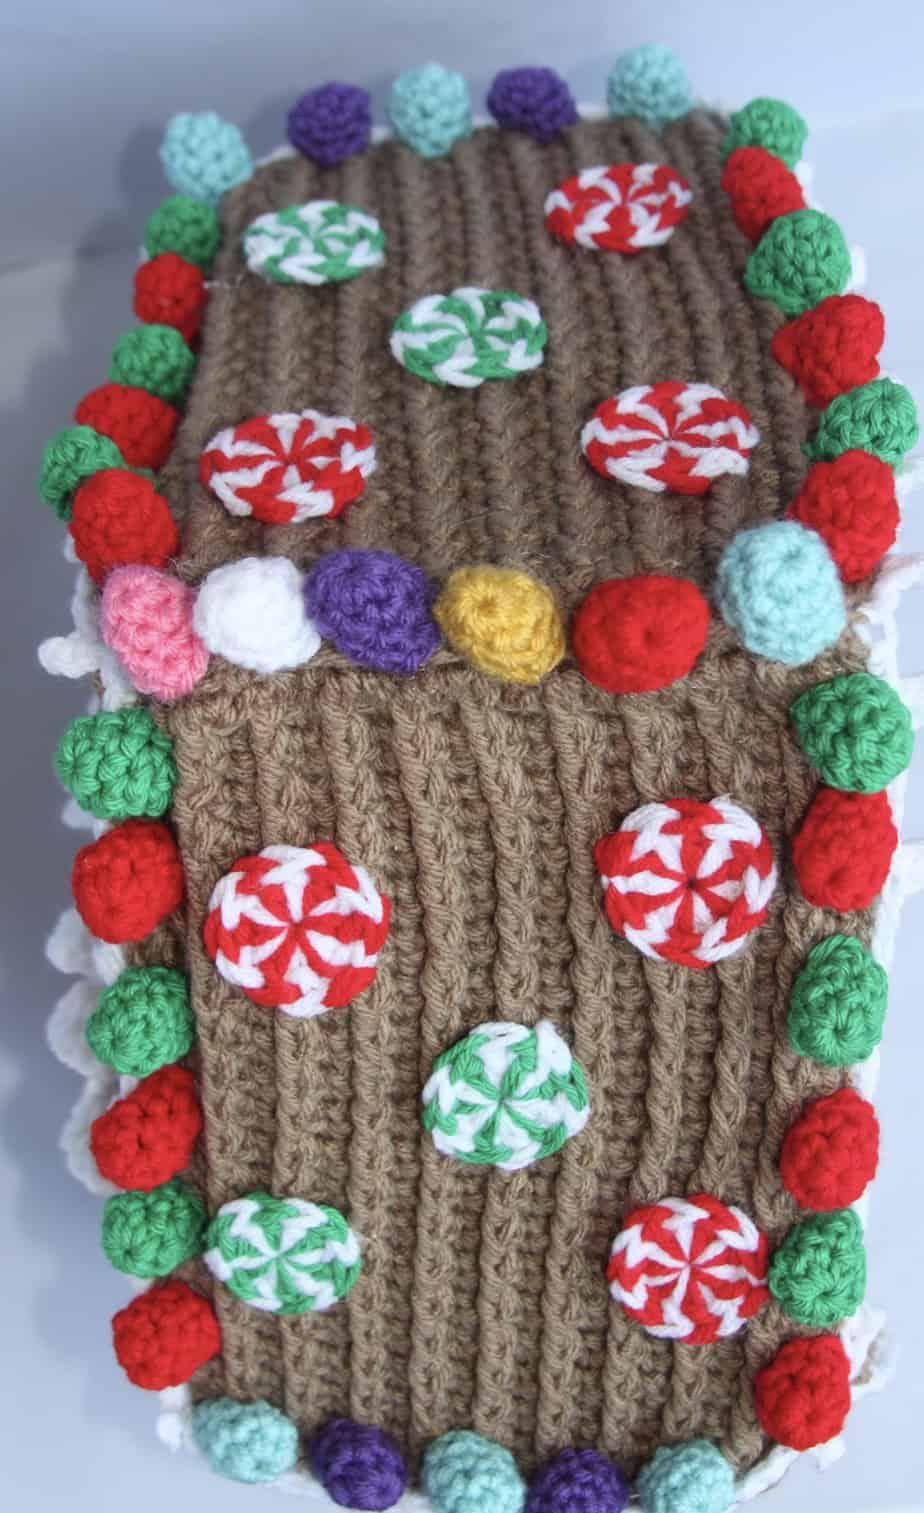 crochet gingerbread house